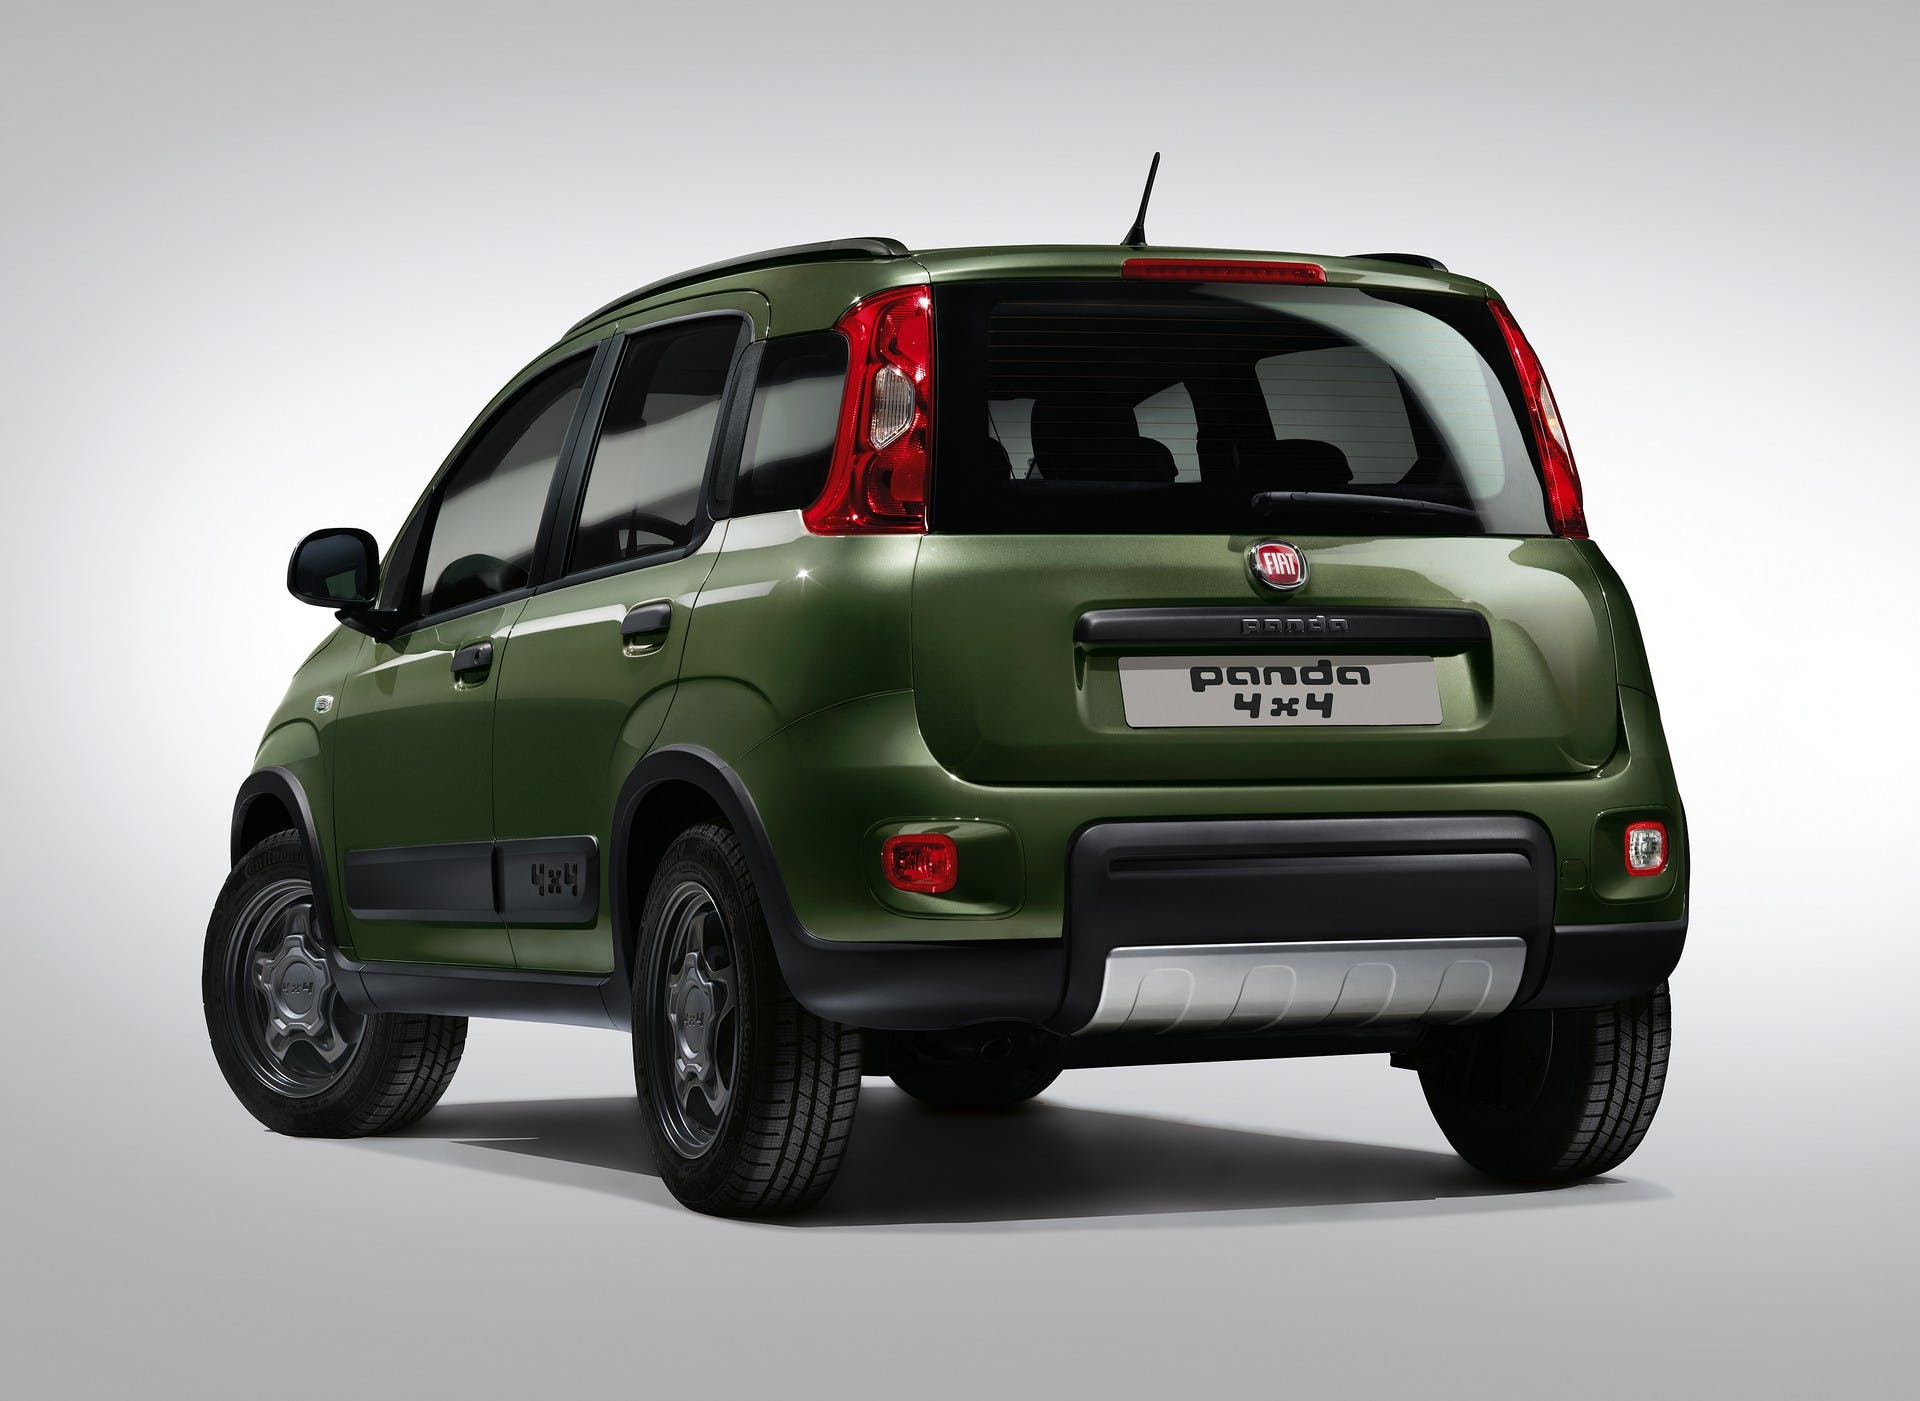 Fiat-Panda-4x4 verde